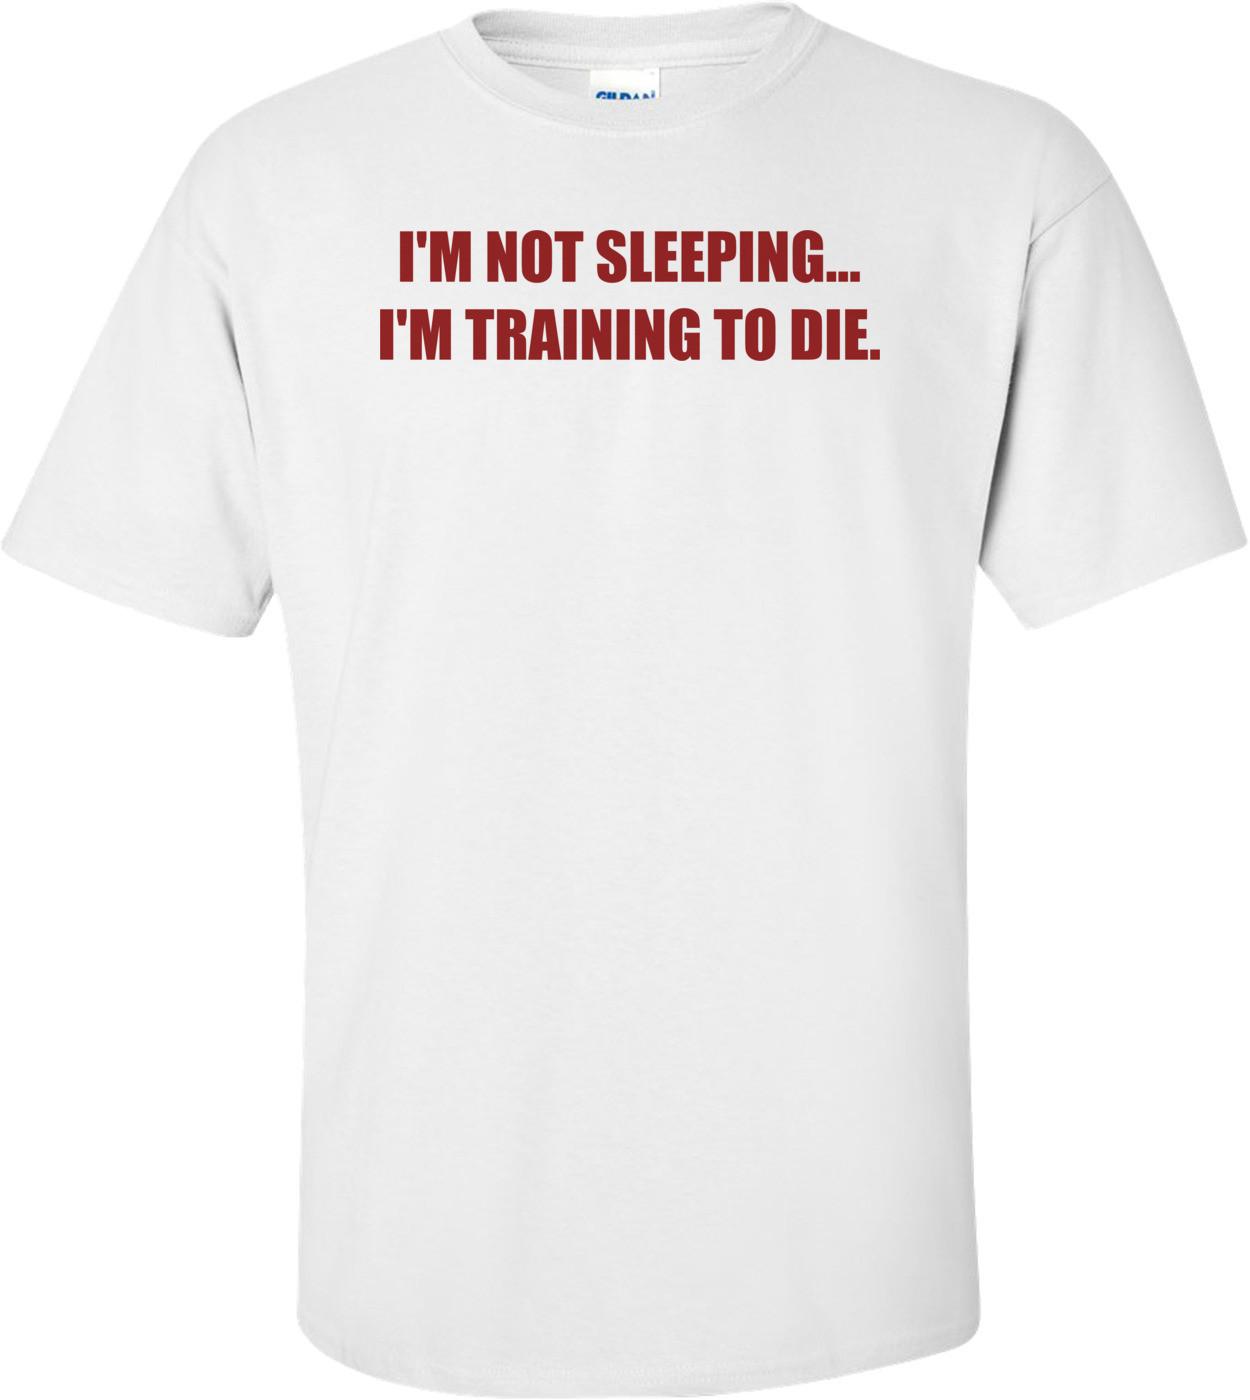 I'M NOT SLEEPING. I'M TRAINING TO DIE. Shirt